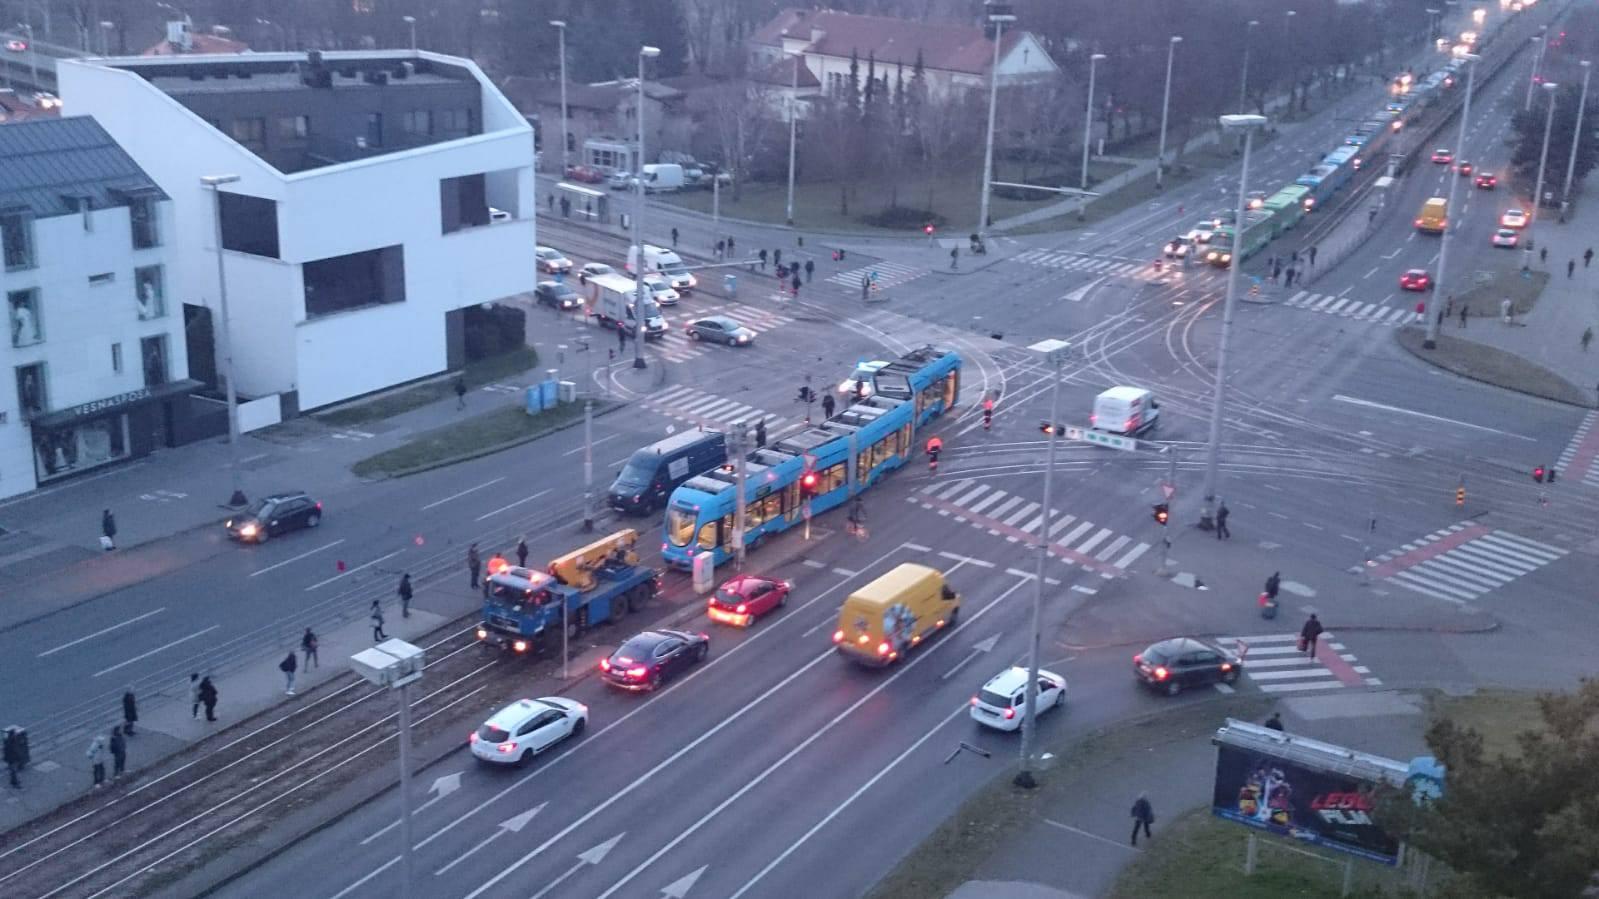 Tramvaj iskočio iz tračnica na Držićevoj: Promet normaliziran